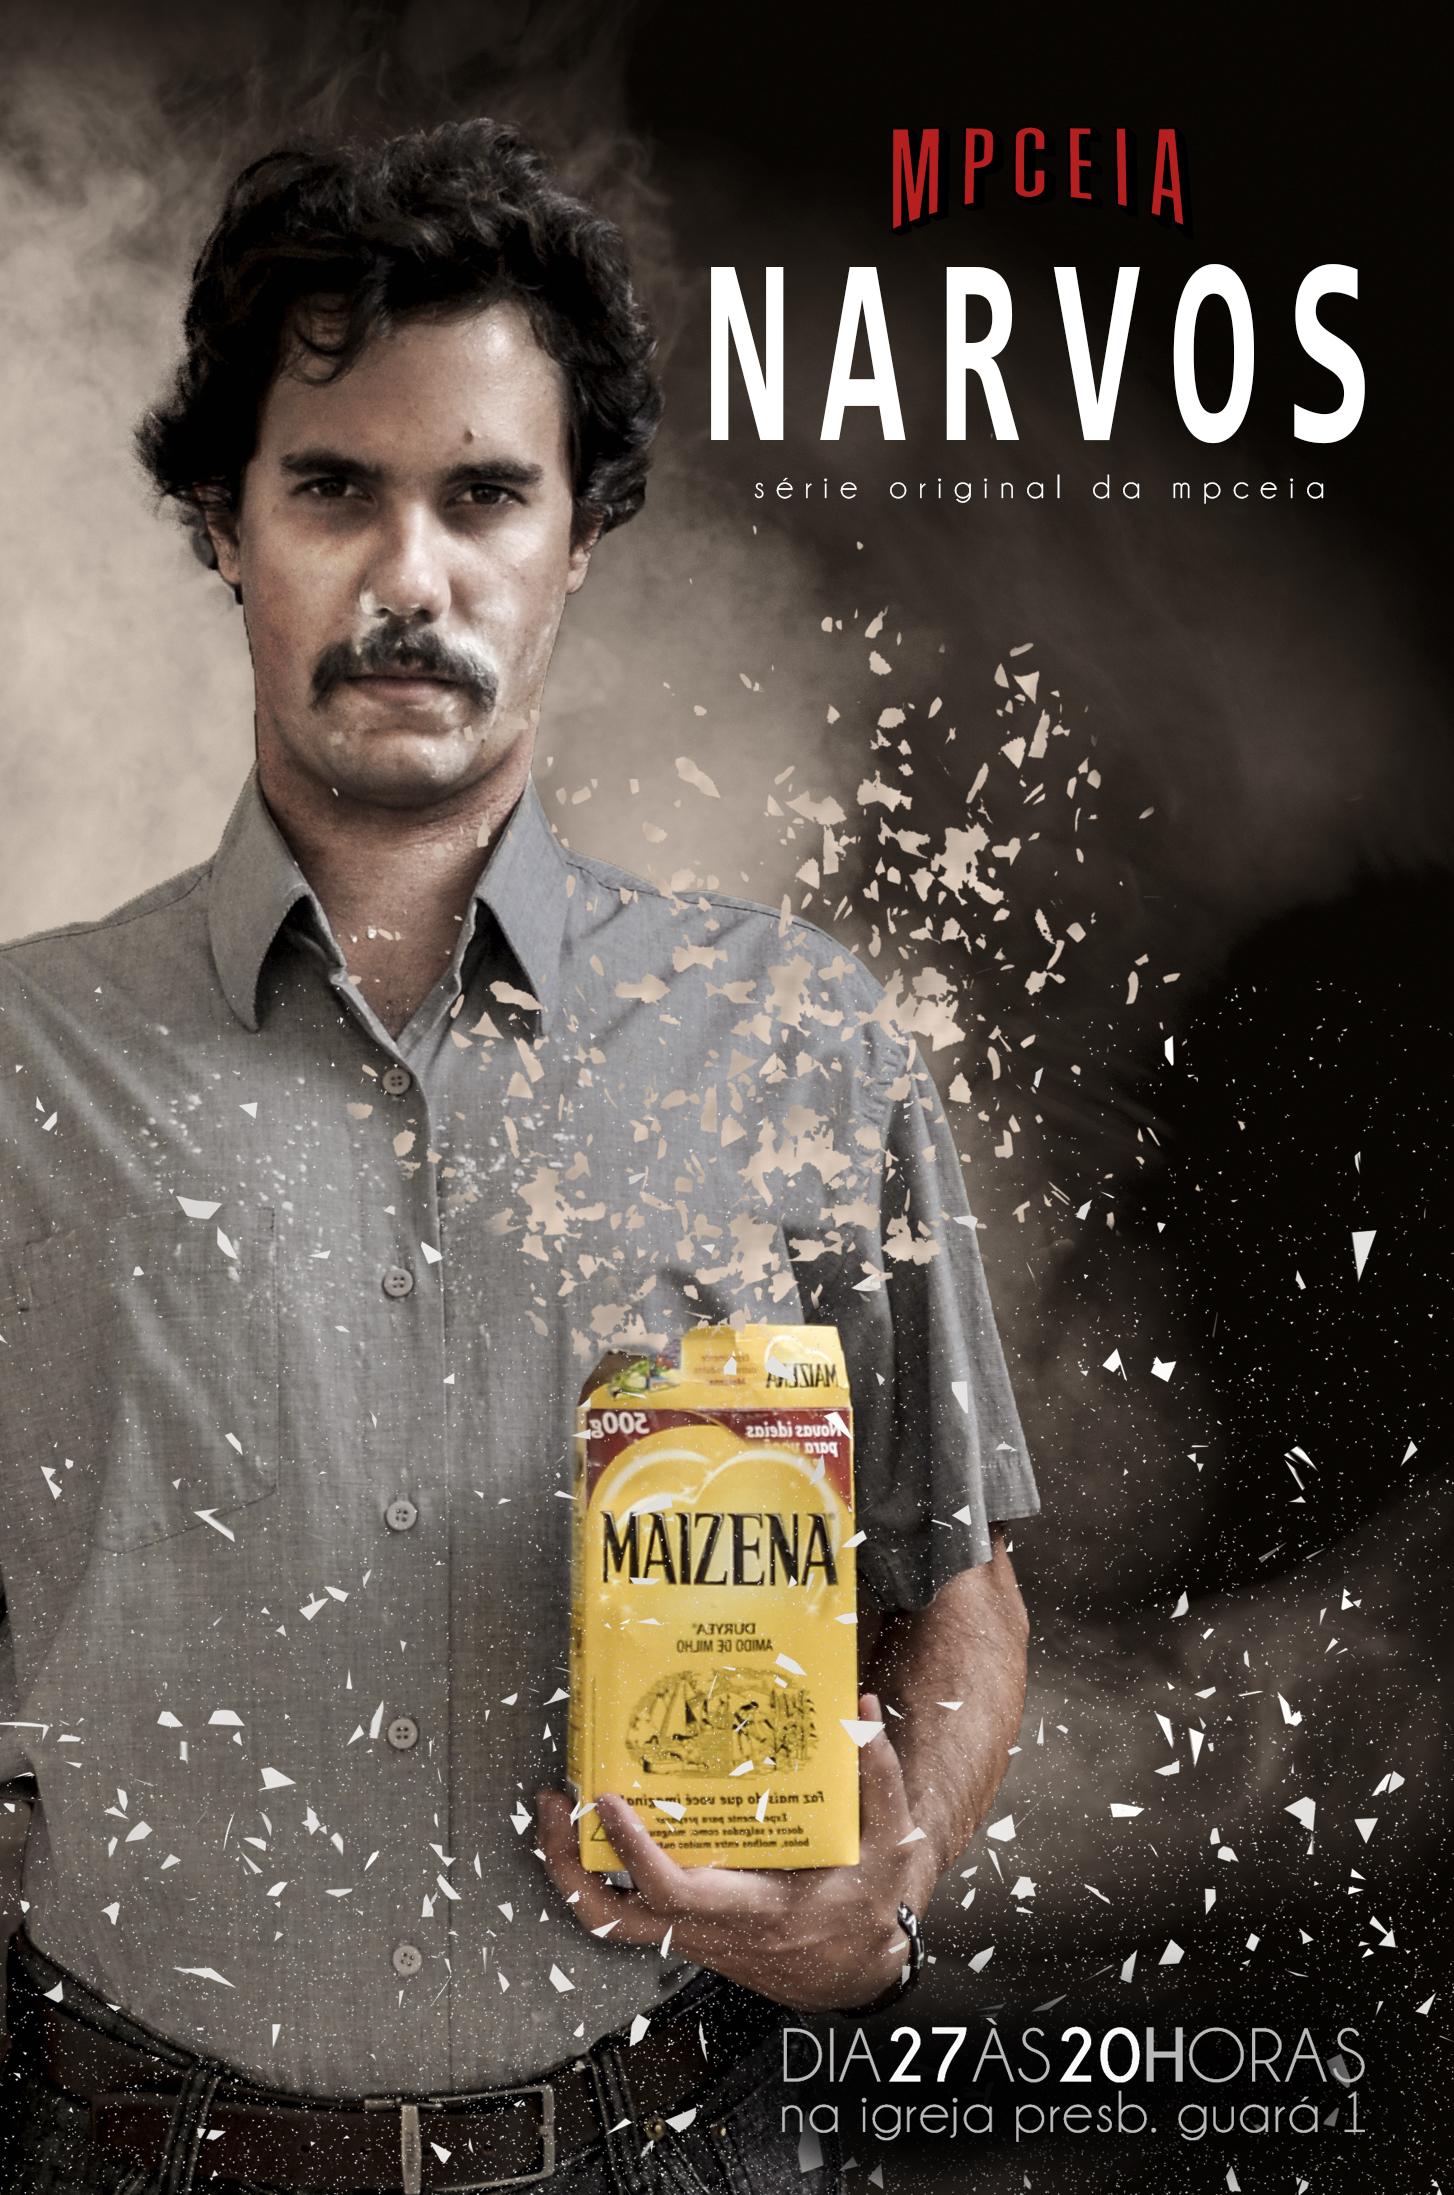 Narvos